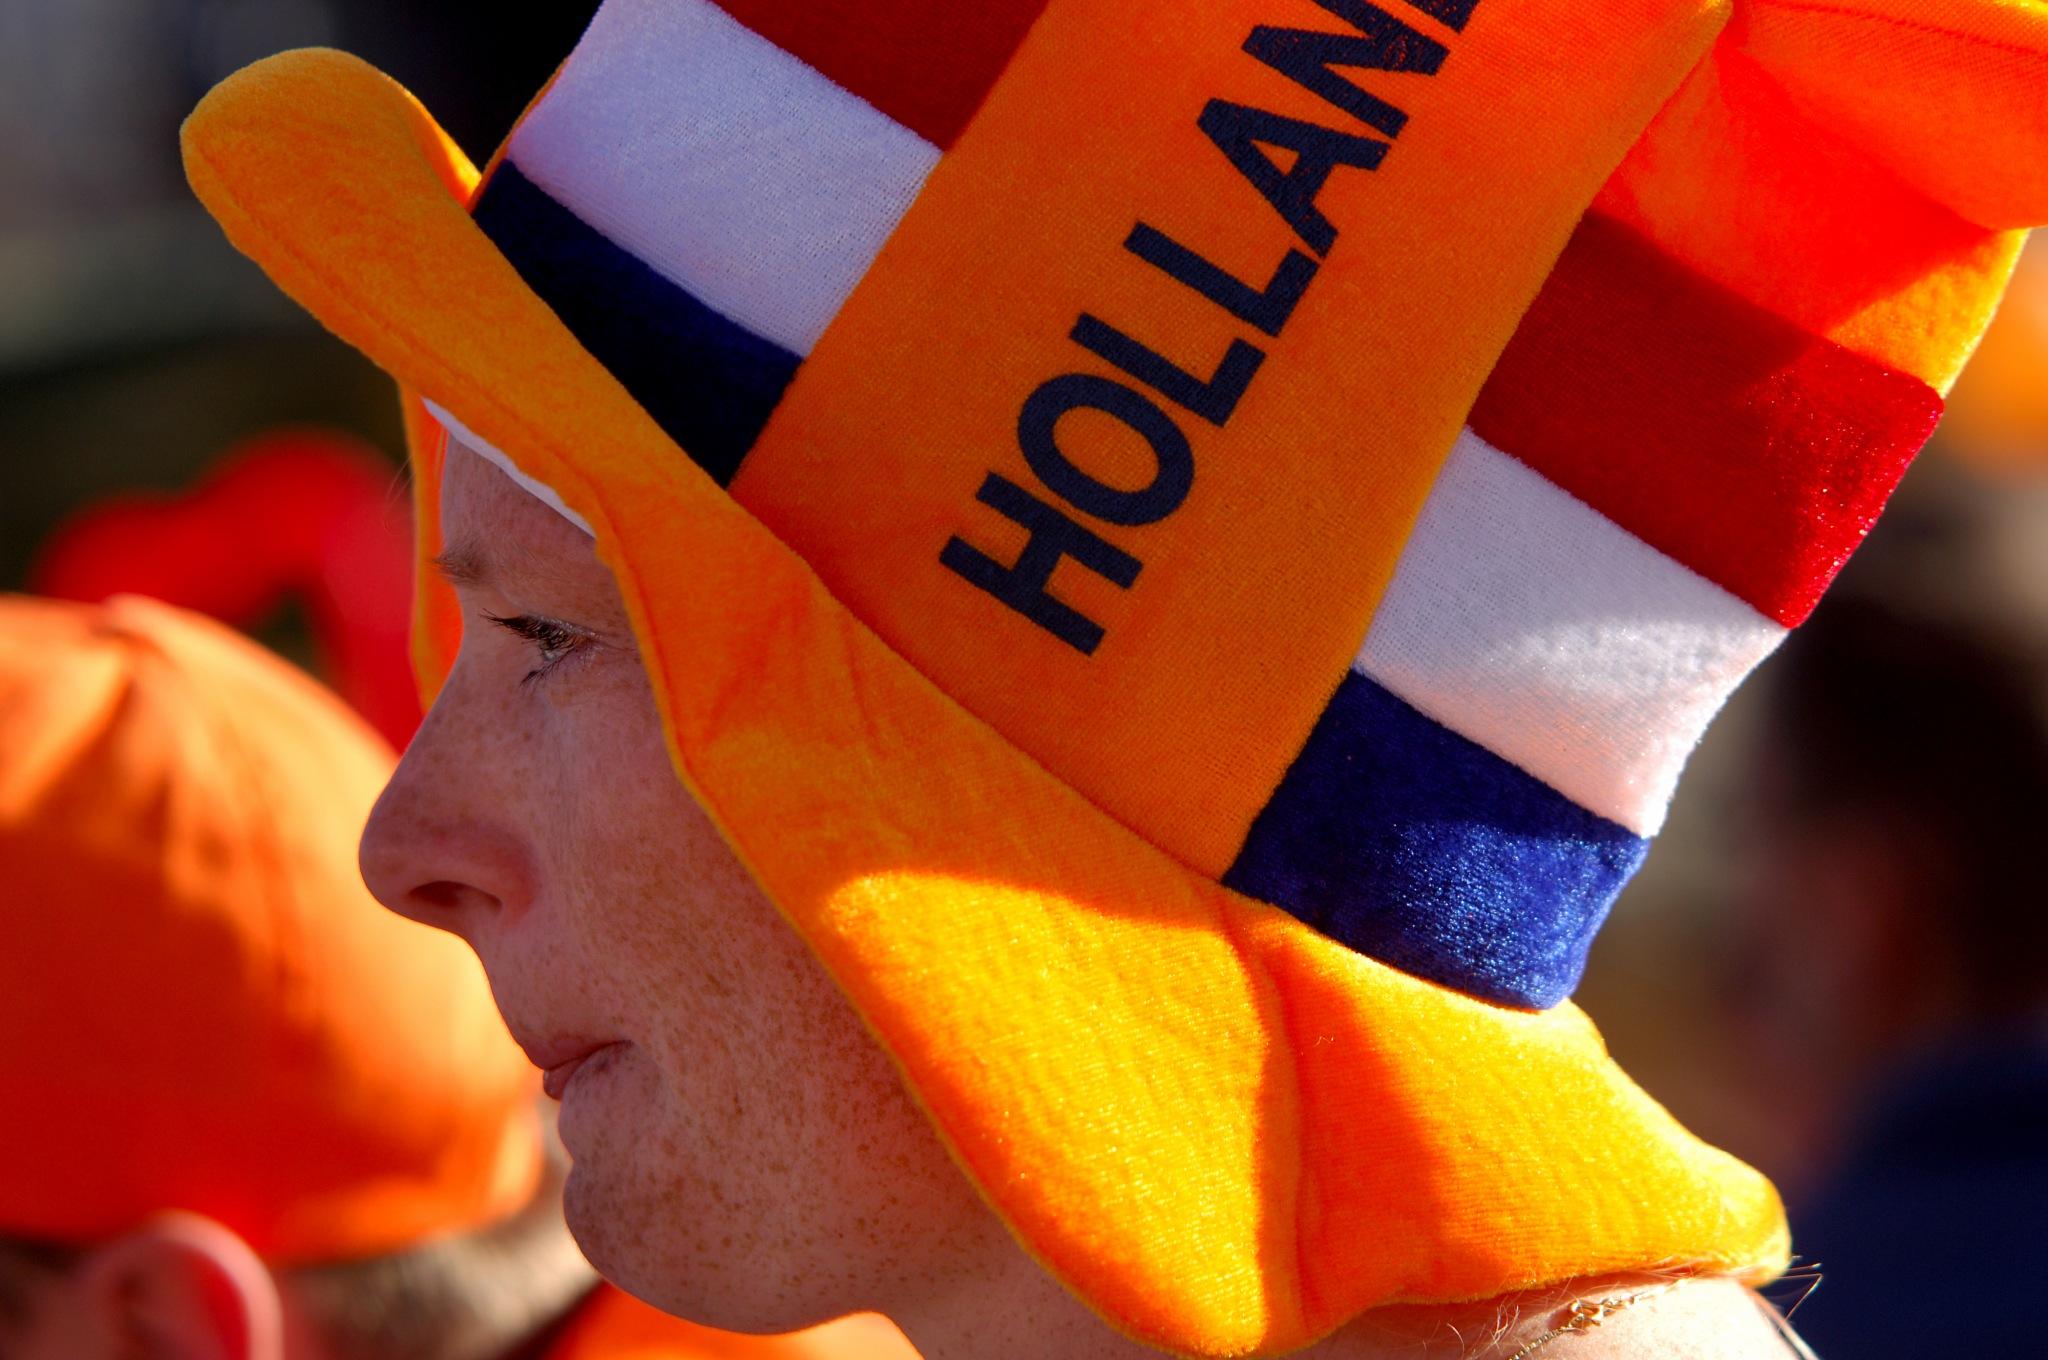 holland by maurizio senoner